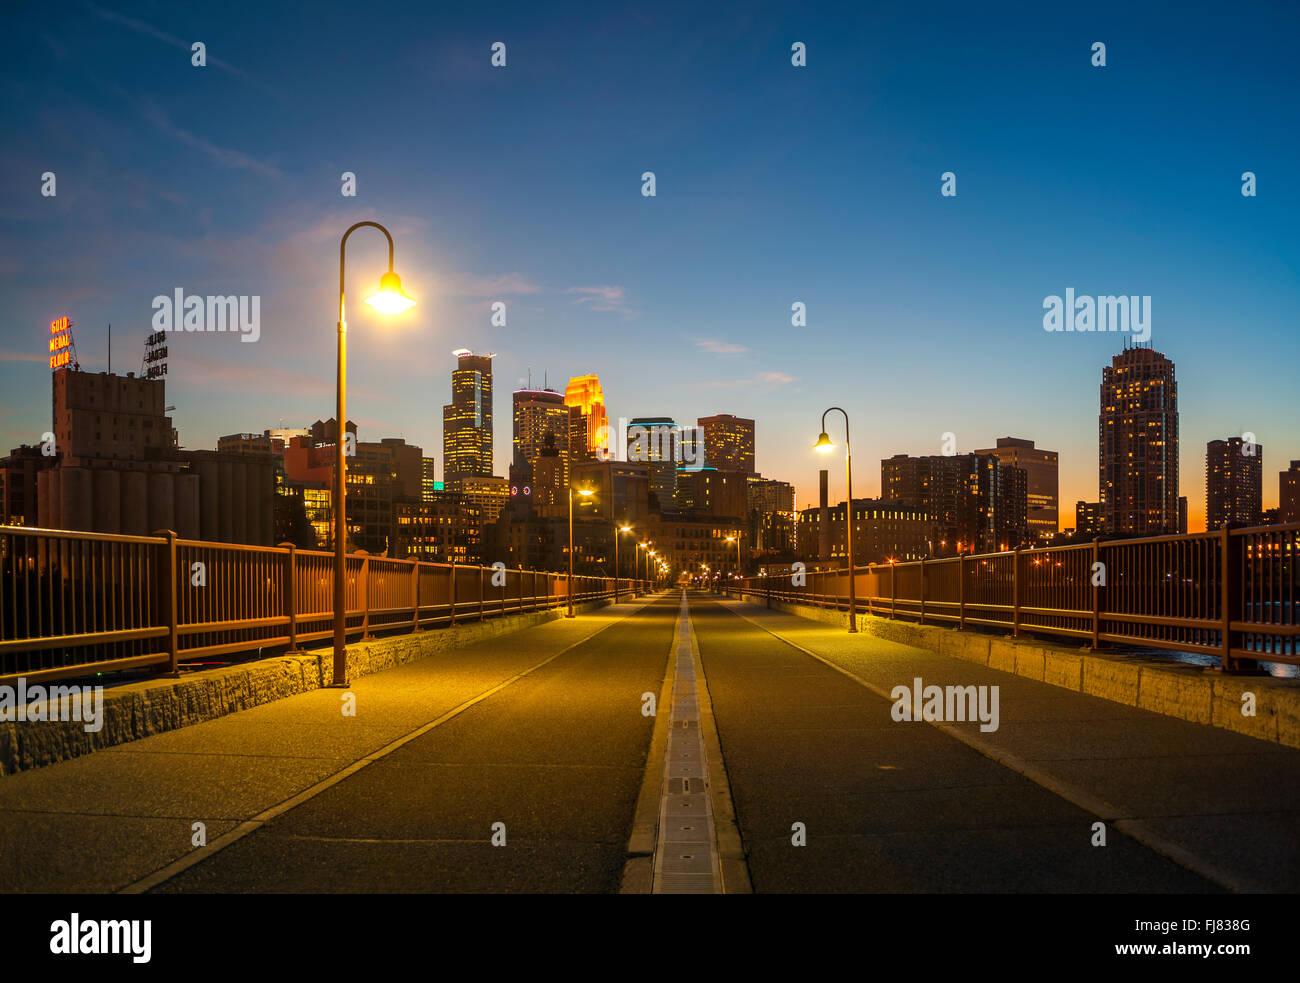 Minneapolis downtown Skyline bei Nacht aus Stein-Bogen-Brücke. Minneapolis Minnesota. Stockfoto